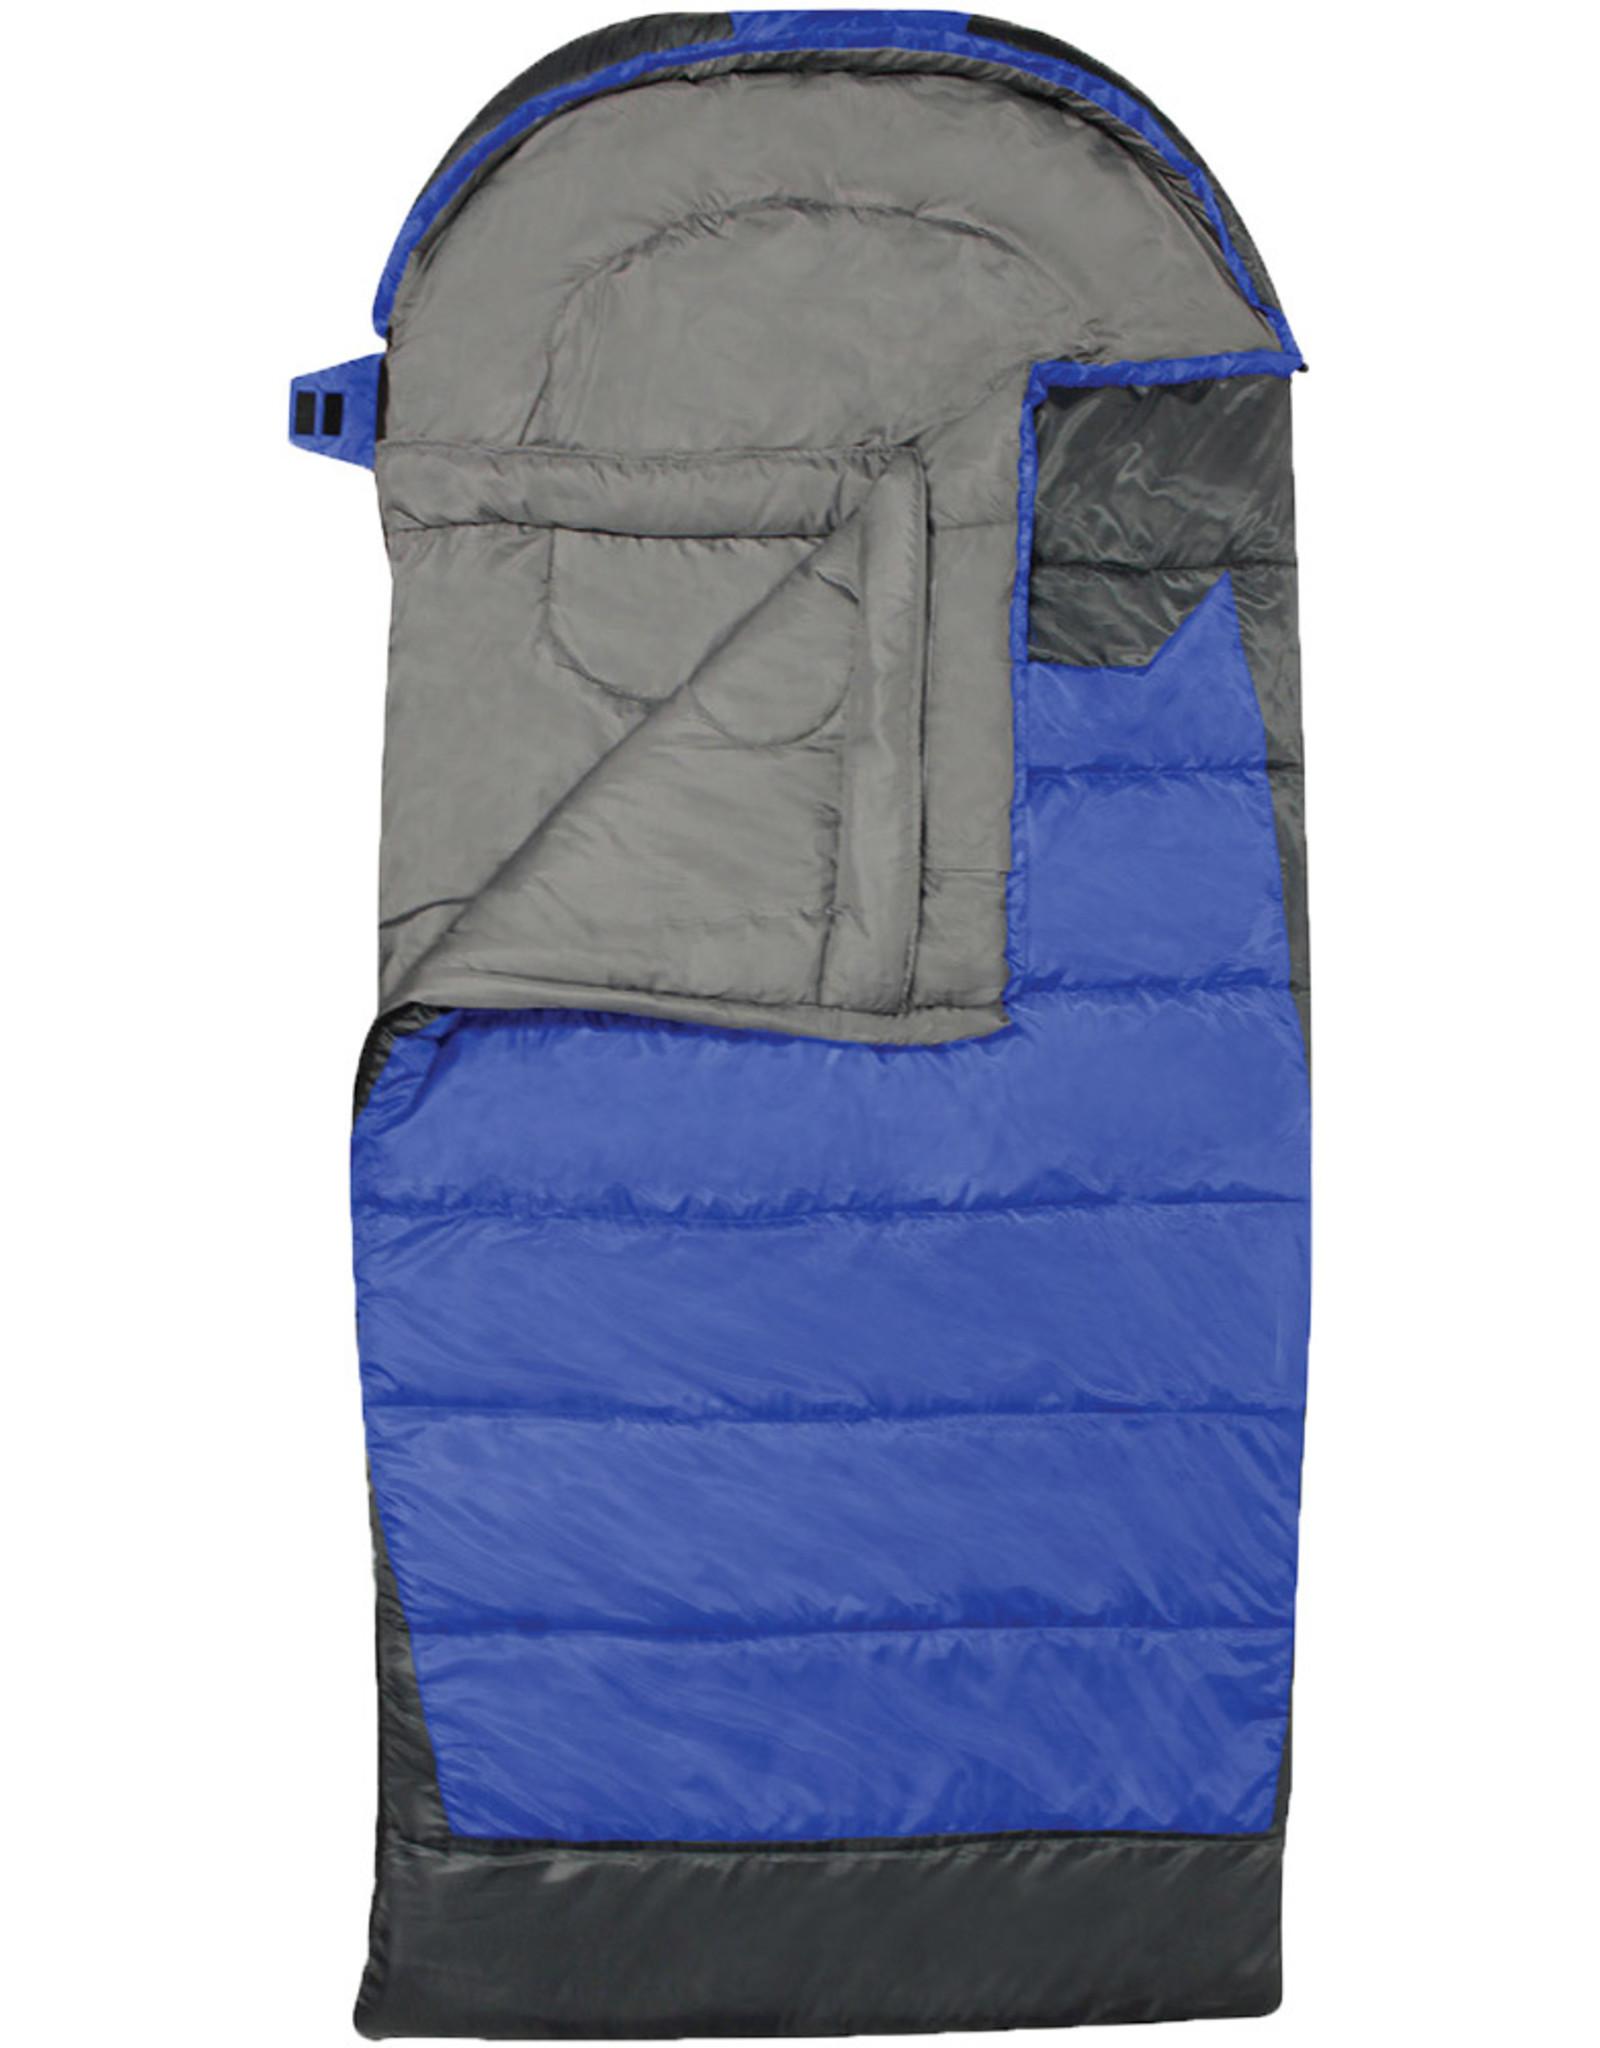 WORLD FAMOUS SALES HEAT ZONE -25C RECTANGULAR SLEEPING BAG